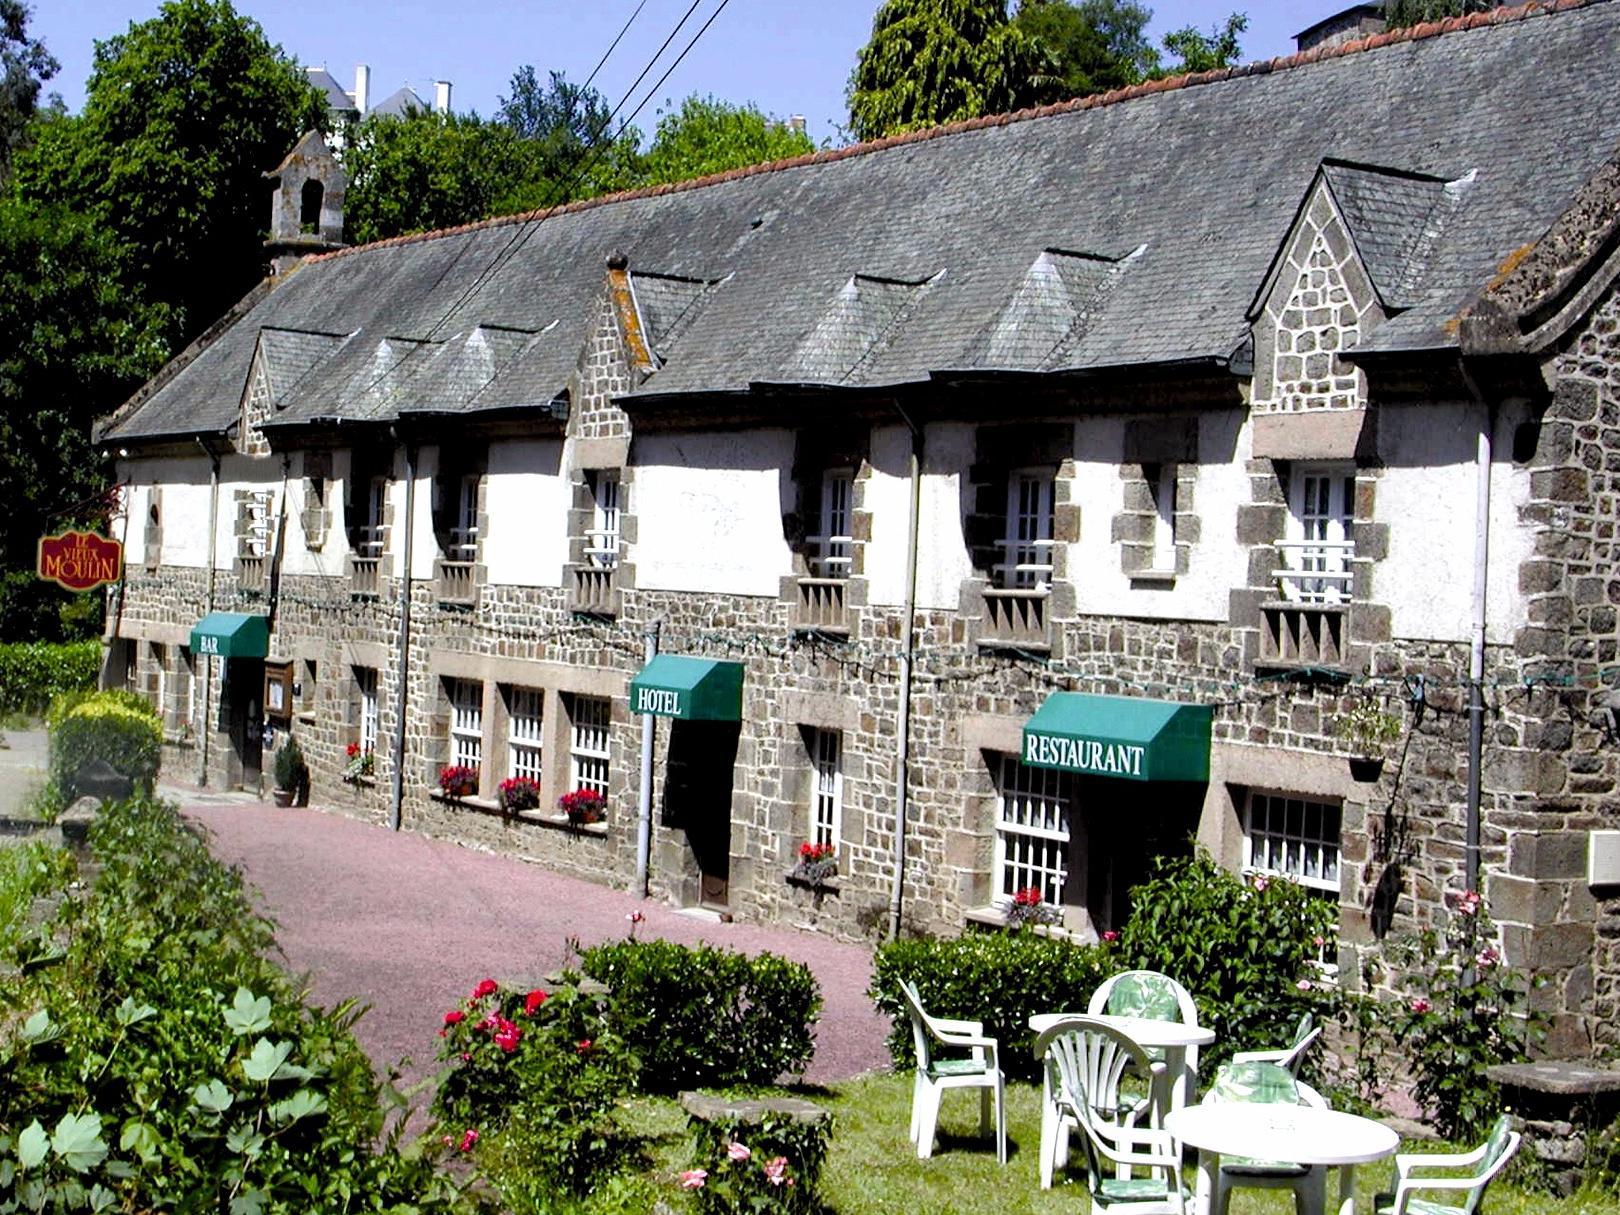 https://medias.logishotels.com/property-images/814/facade/retro/grand/hostellerie-du-vieux-moulin-facade-hede-bazouges-953089.jpg